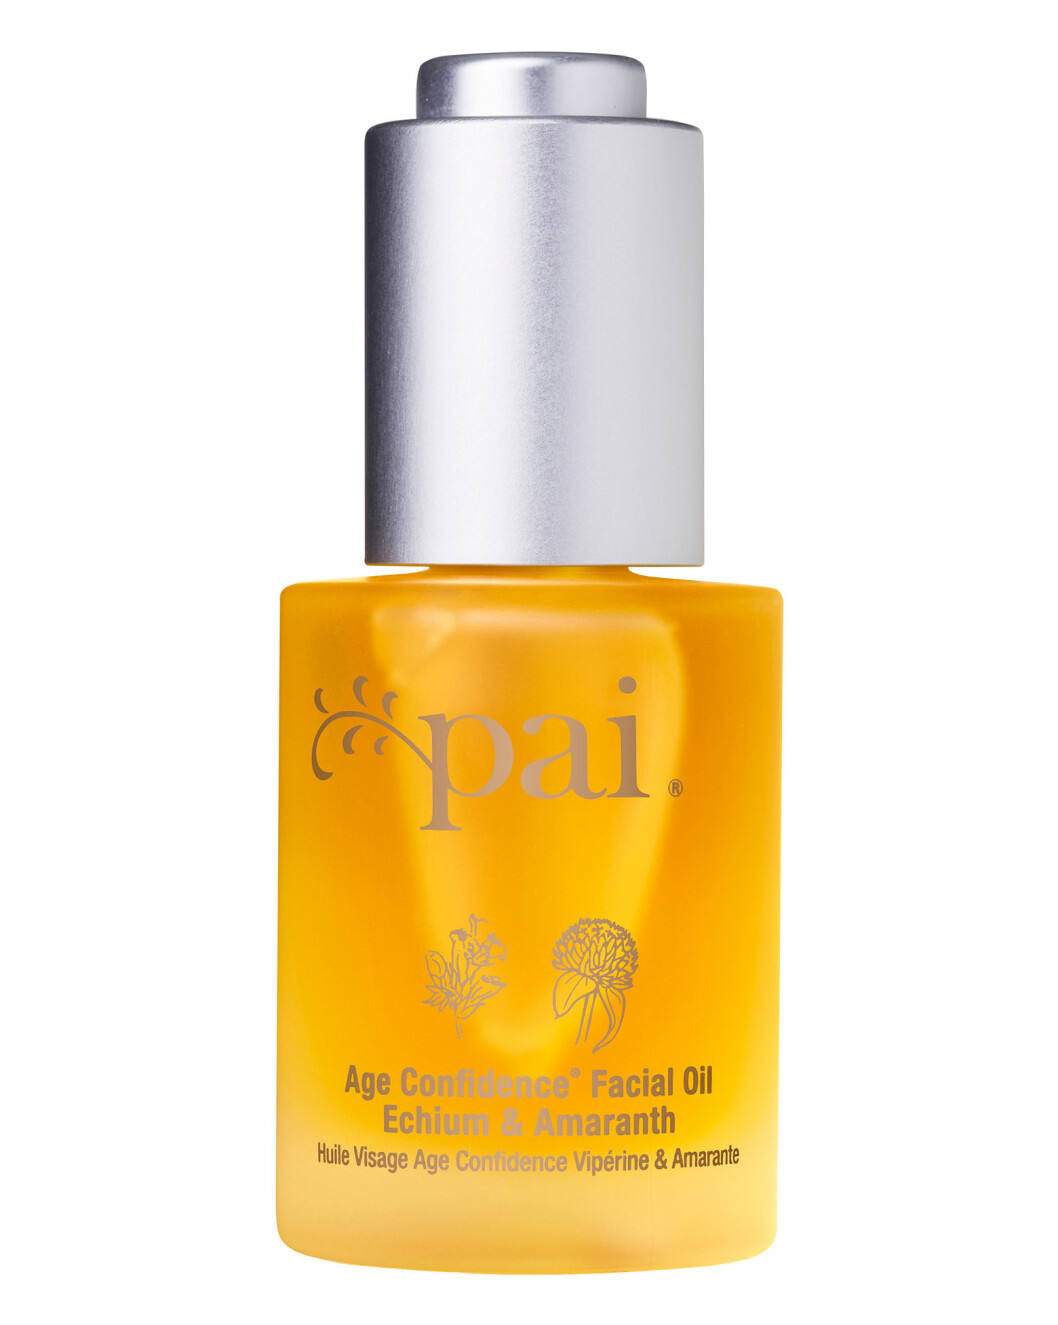 Antiage olje for sensitiv hud (kr 565, Pai Skincare, Age Confidence Facial Oil Echium & Amaranth).